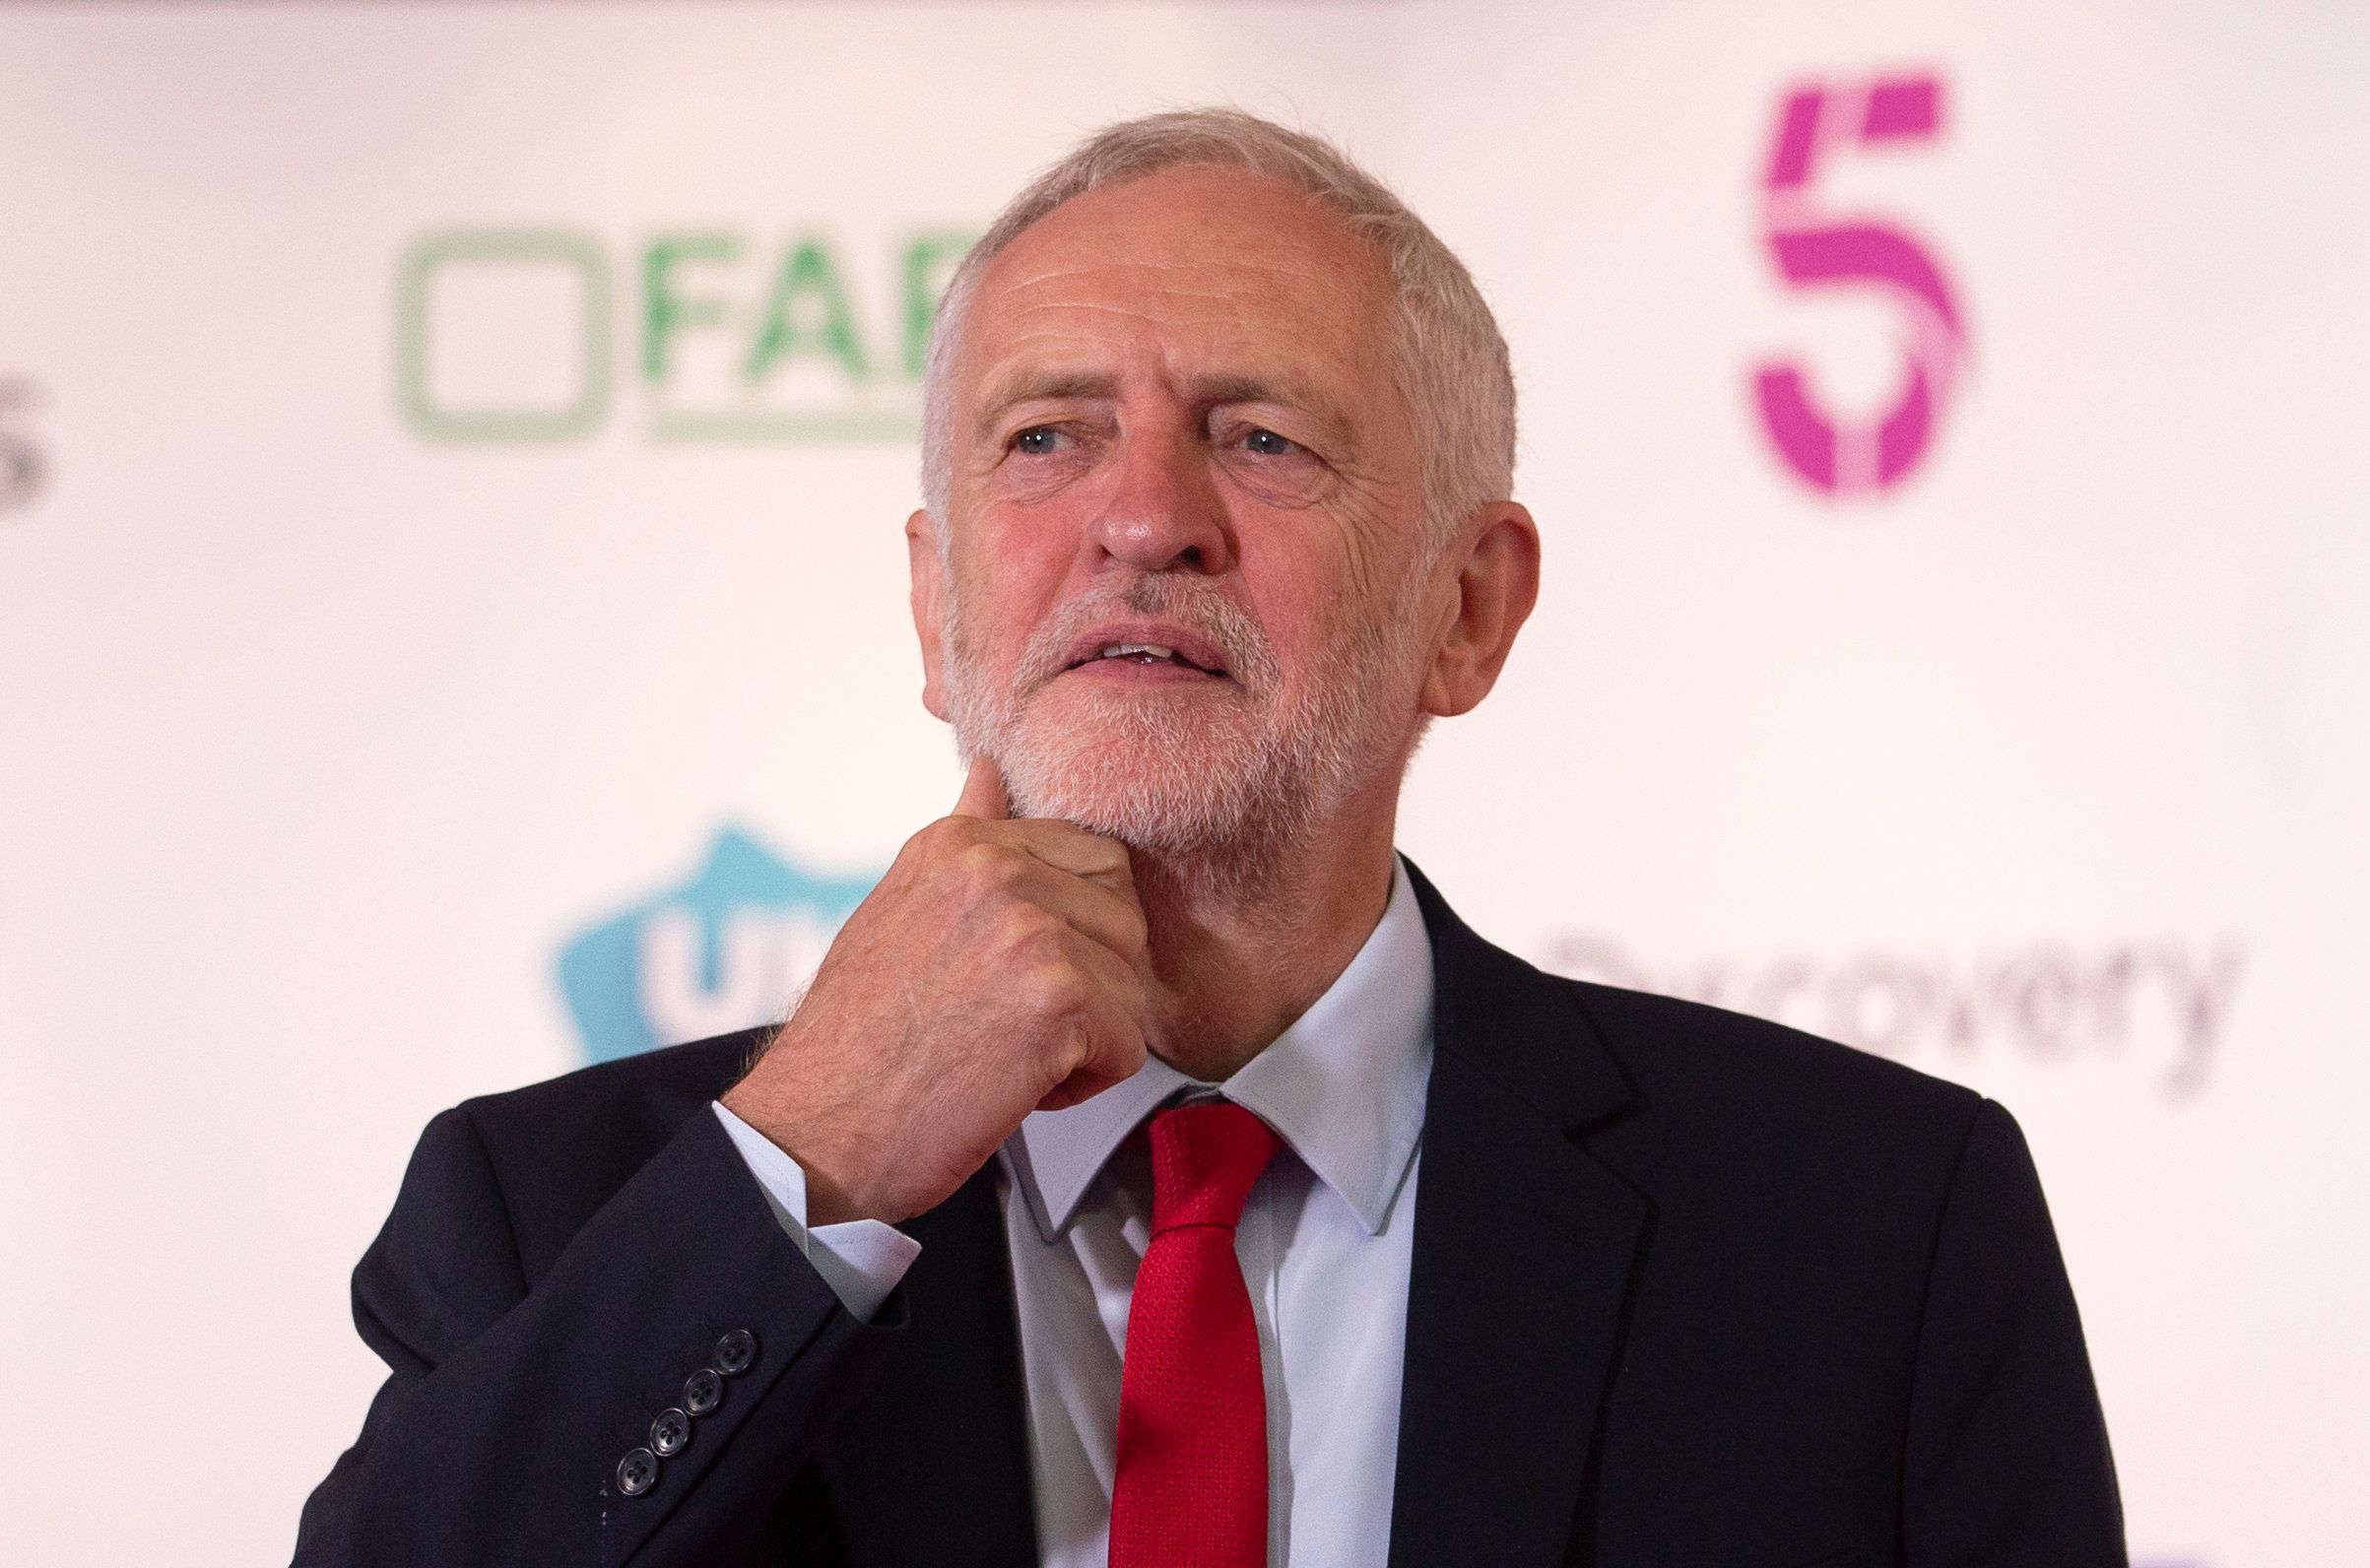 EXCLUSIVE: Labour To Debate 'Extending' Free Movement Beyond EU